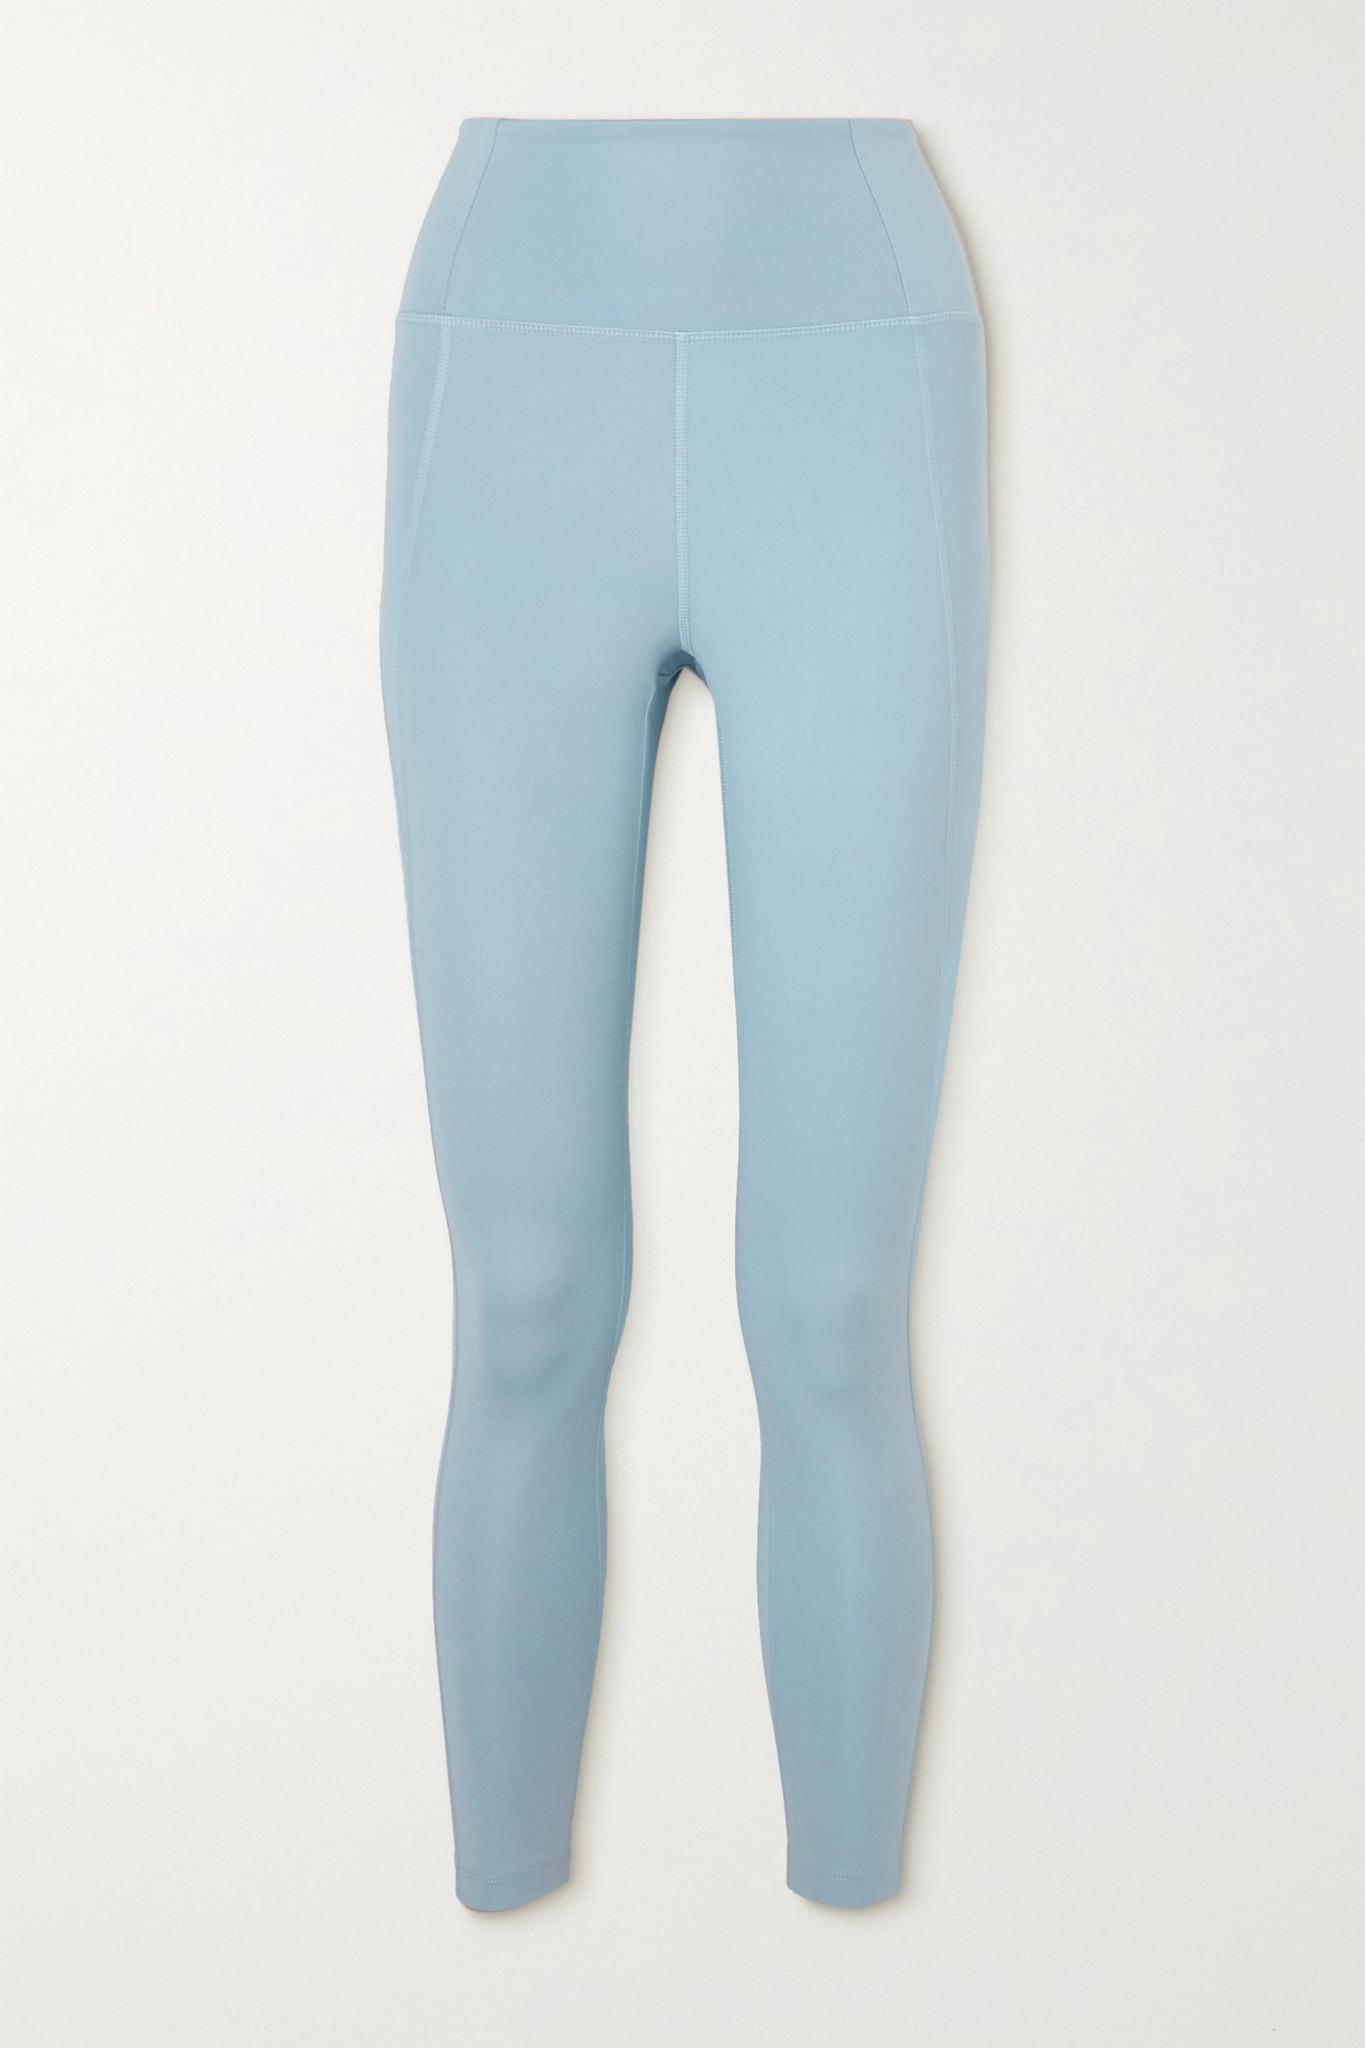 GIRLFRIEND COLLECTIVE - Compressive 弹力紧身运动裤 - 蓝色 - XXS